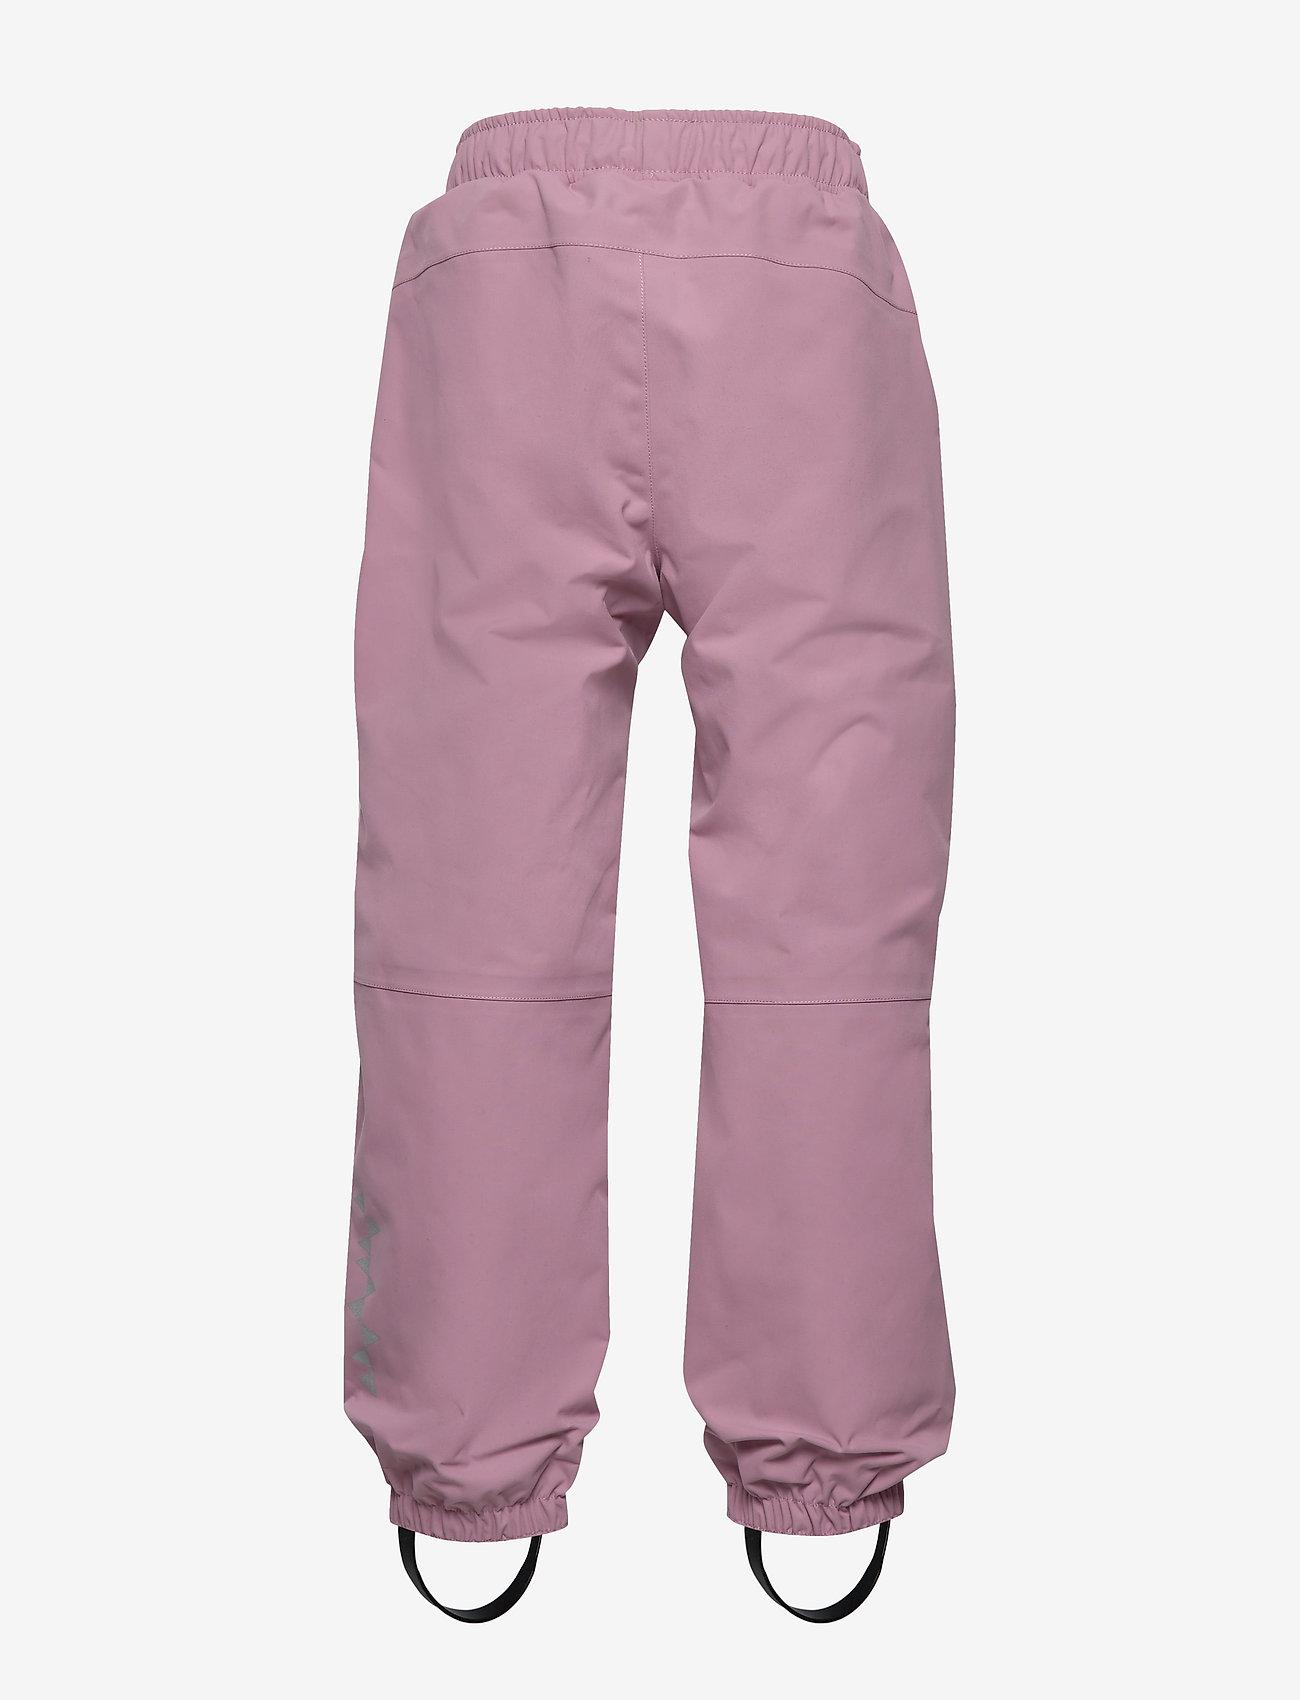 ISBJÖRN of Sweden - RAIN Pant 2L - shell & rain pants - dusty pink - 1